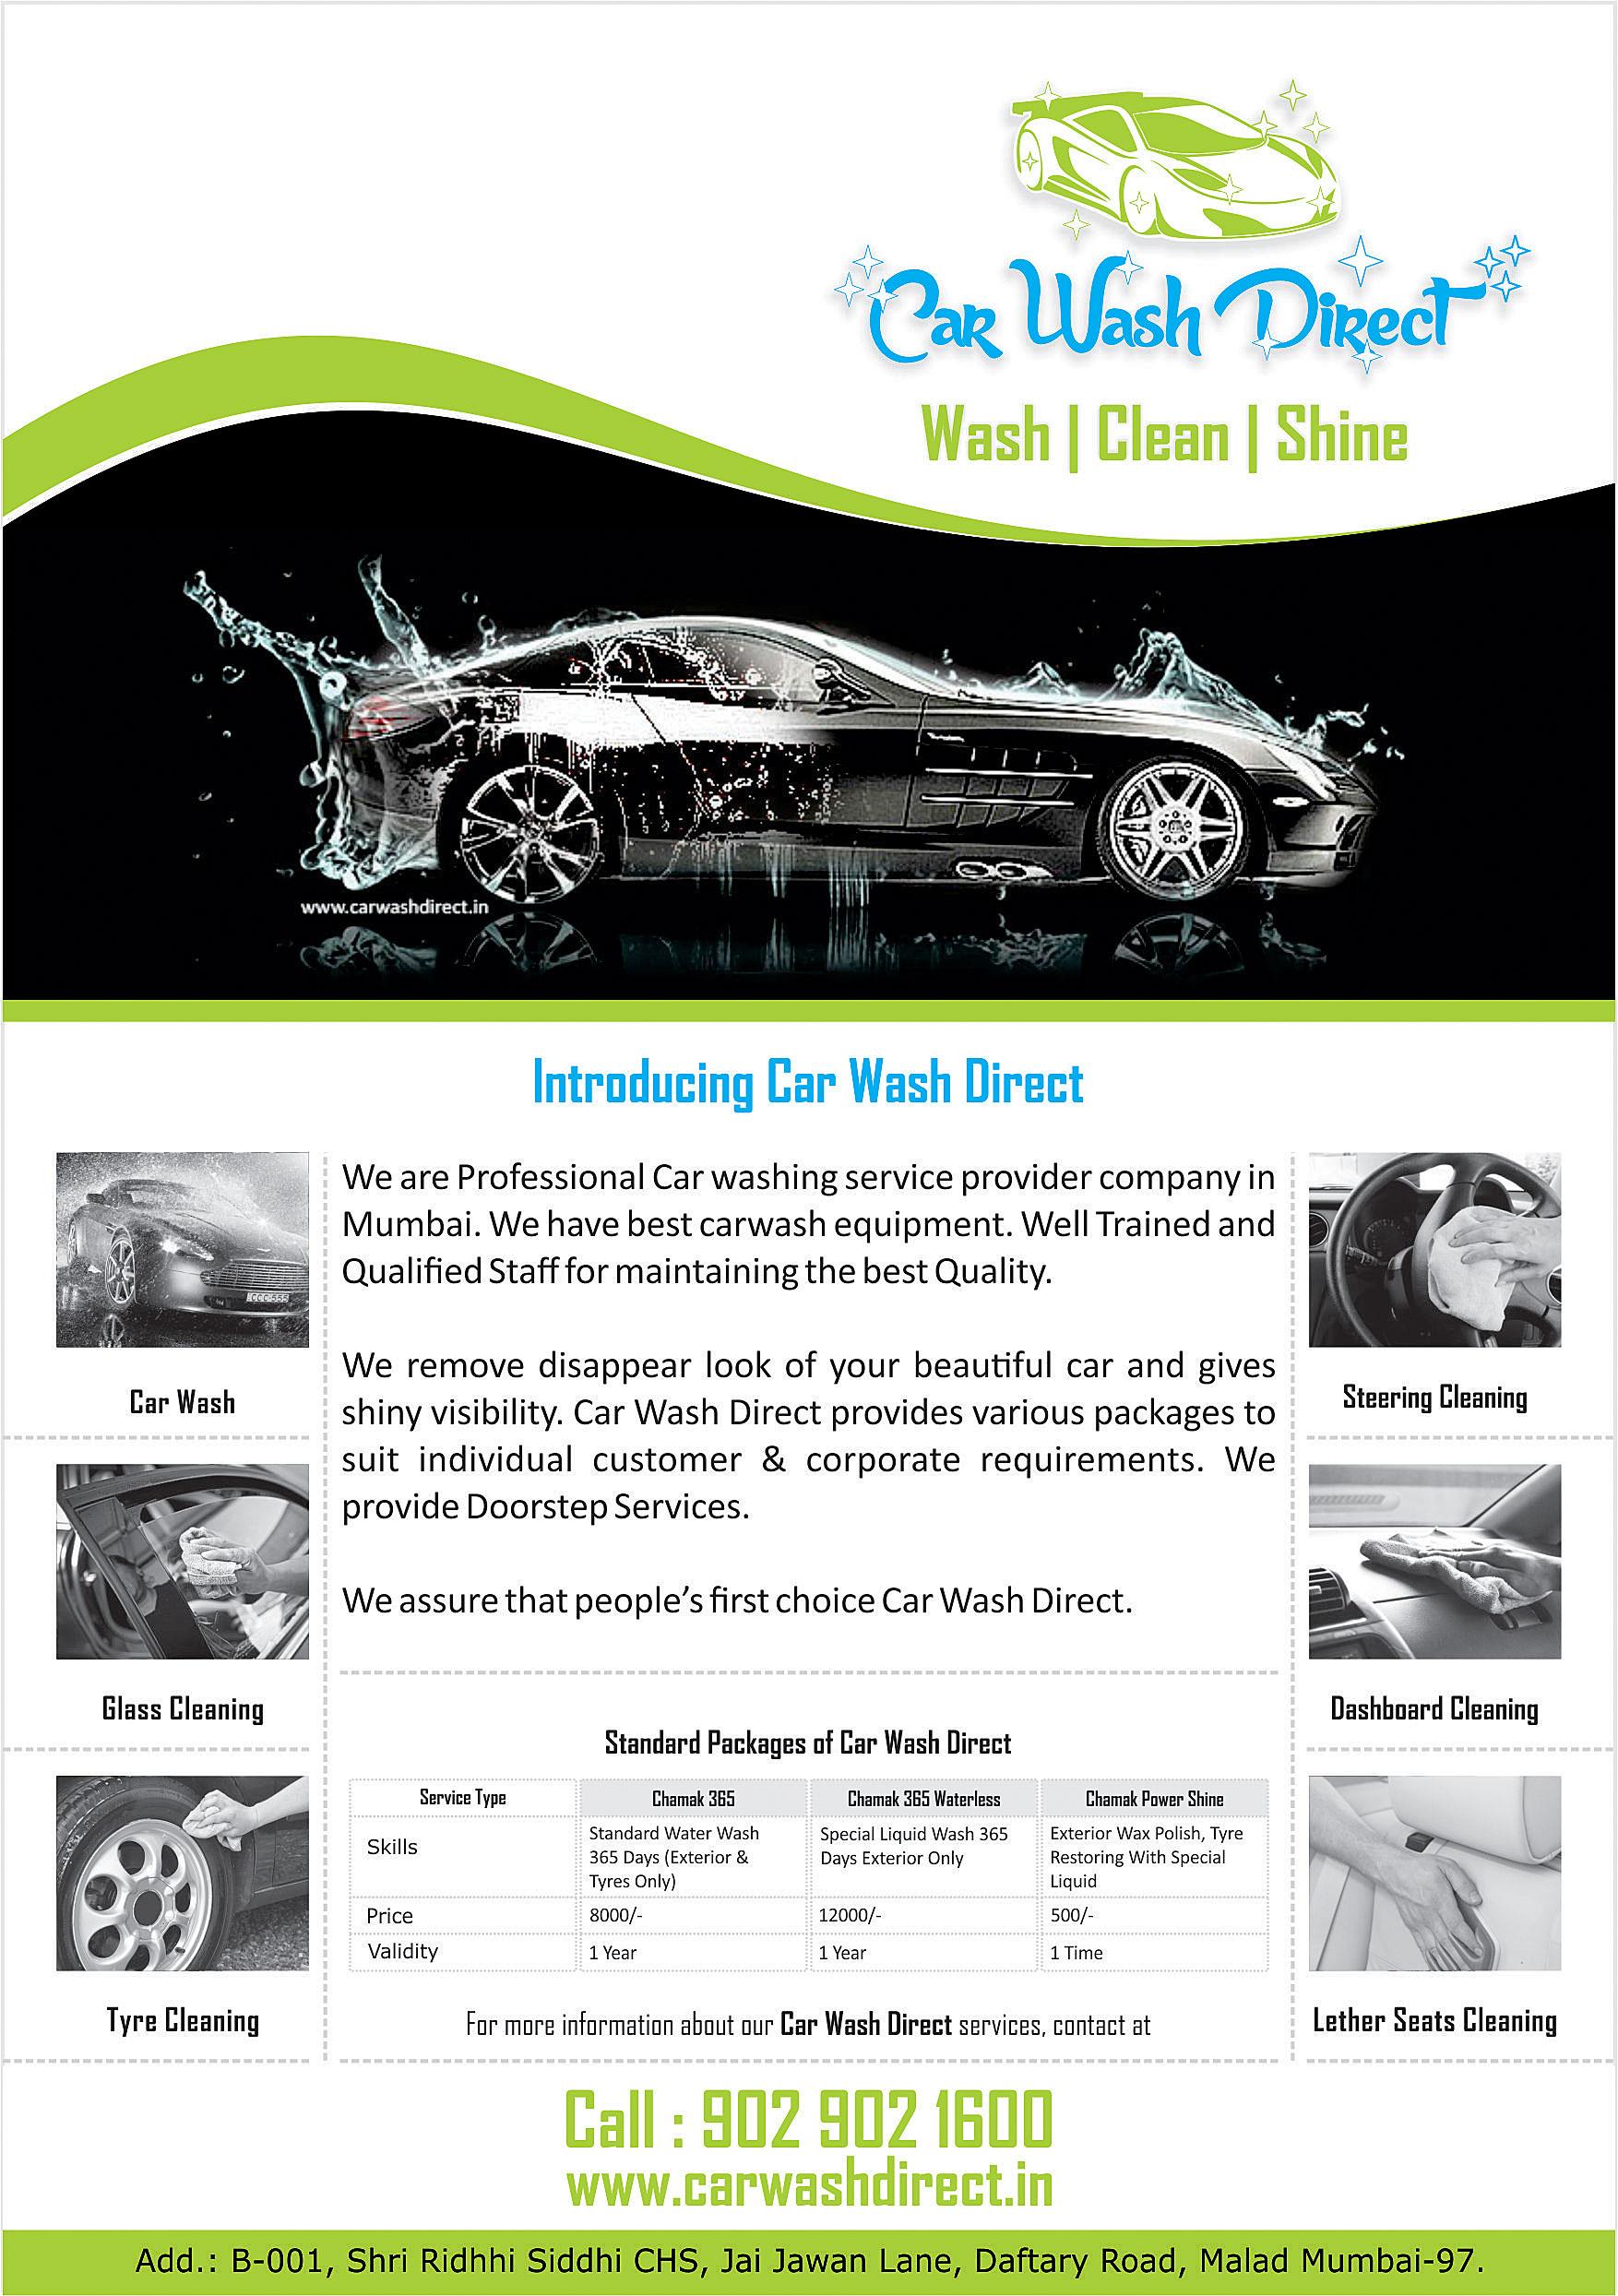 Car Wash Direct - 9029021600 by Raj Bhanse at Coroflot.com